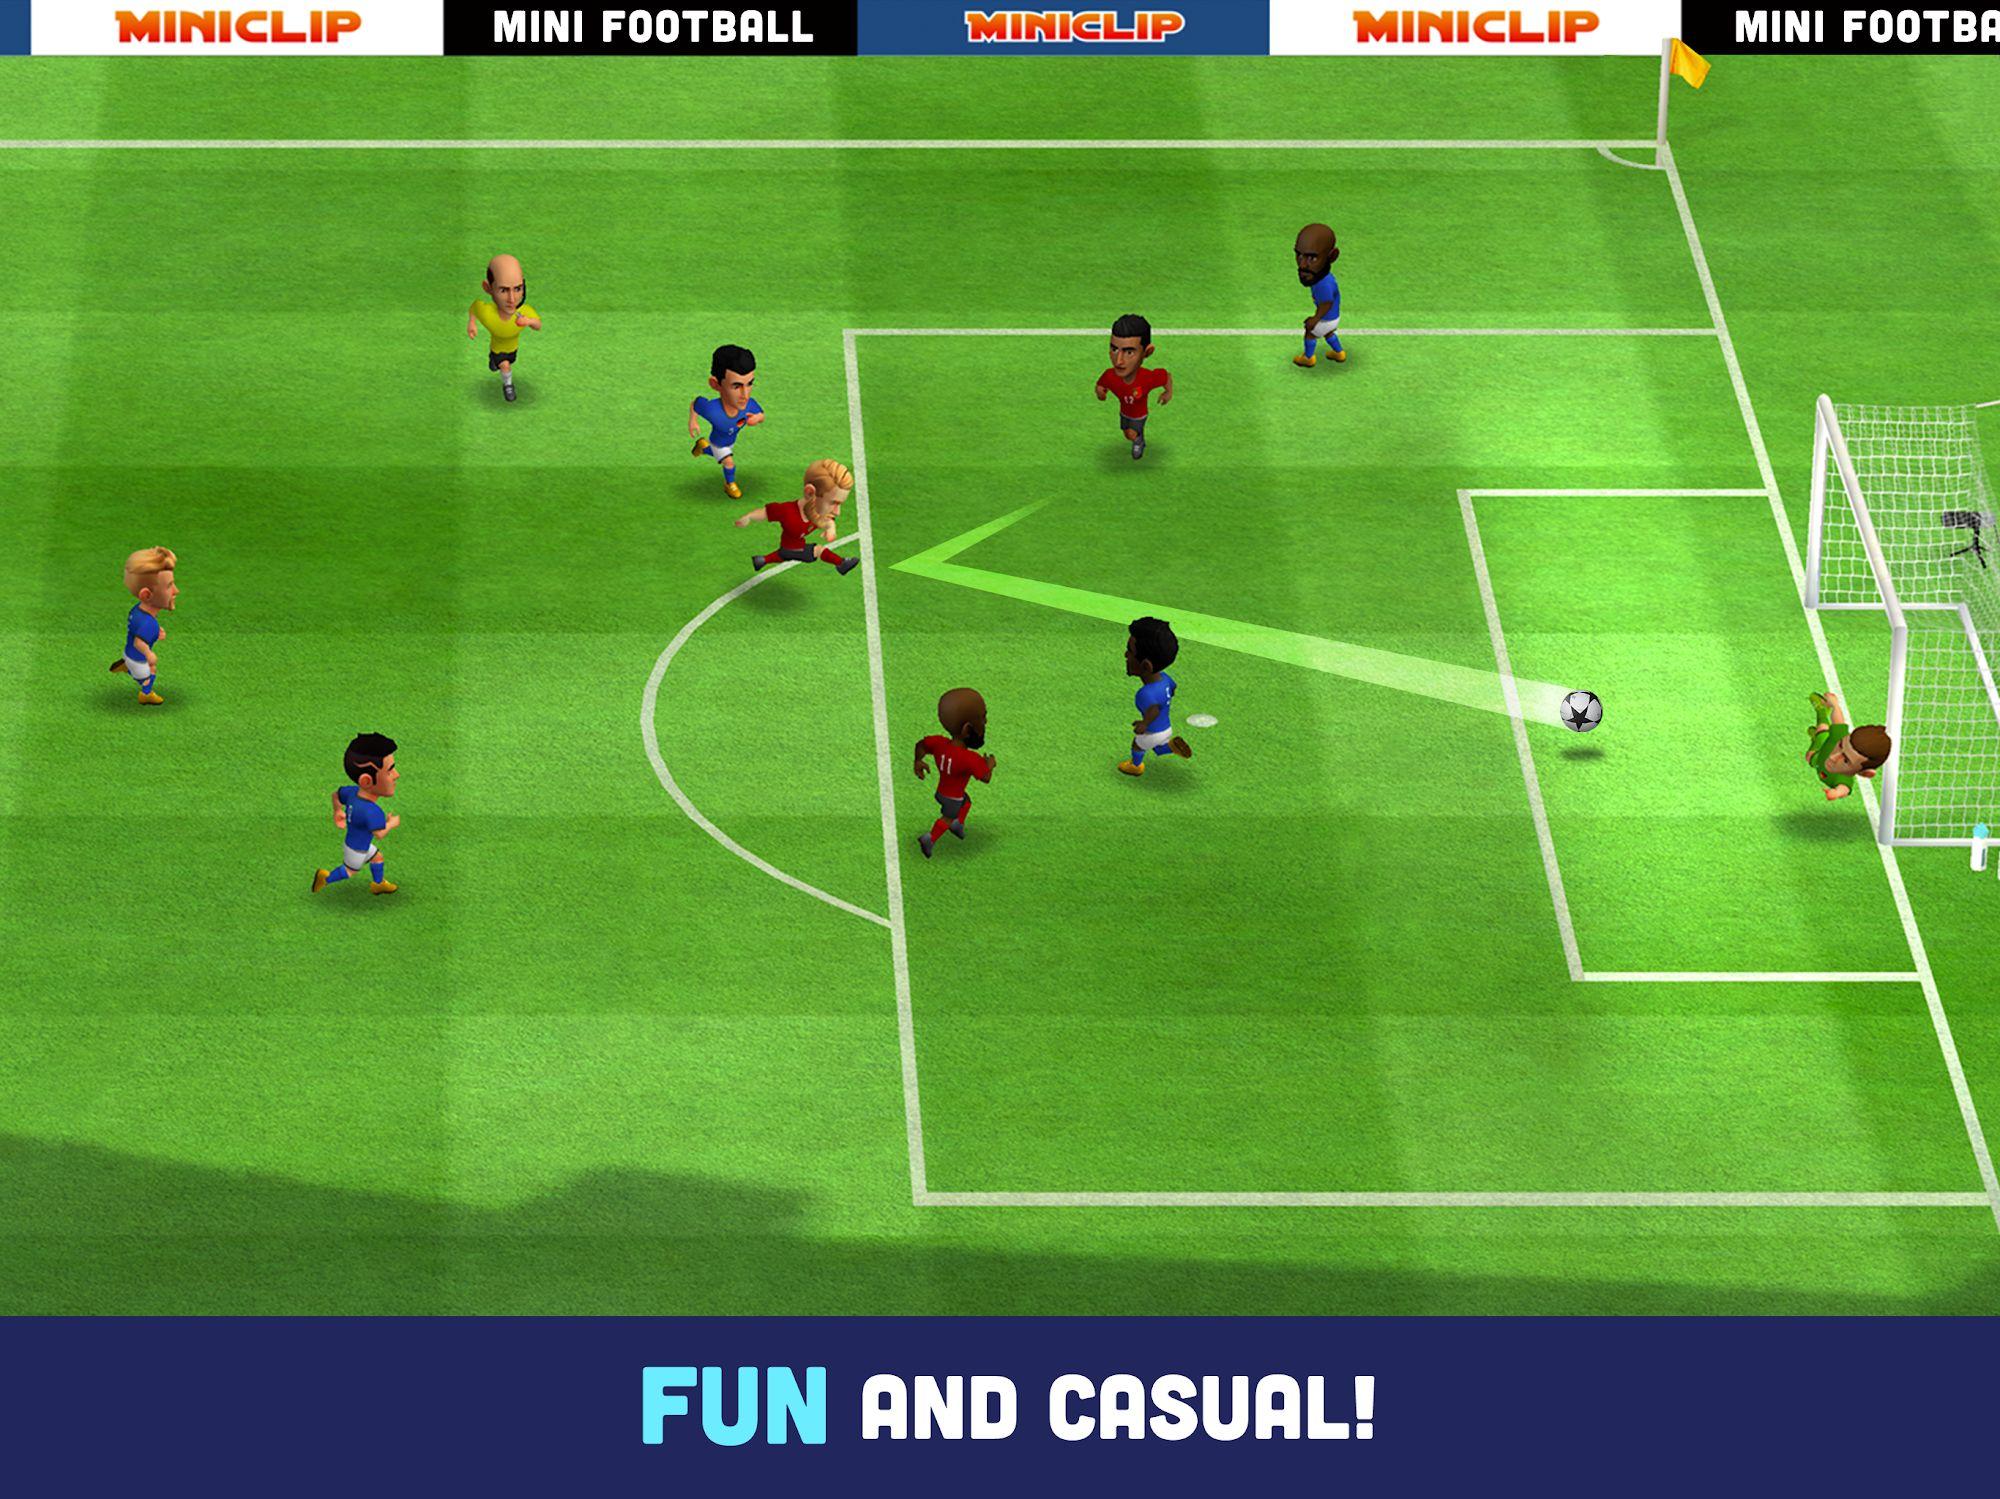 Mini Football pour Android